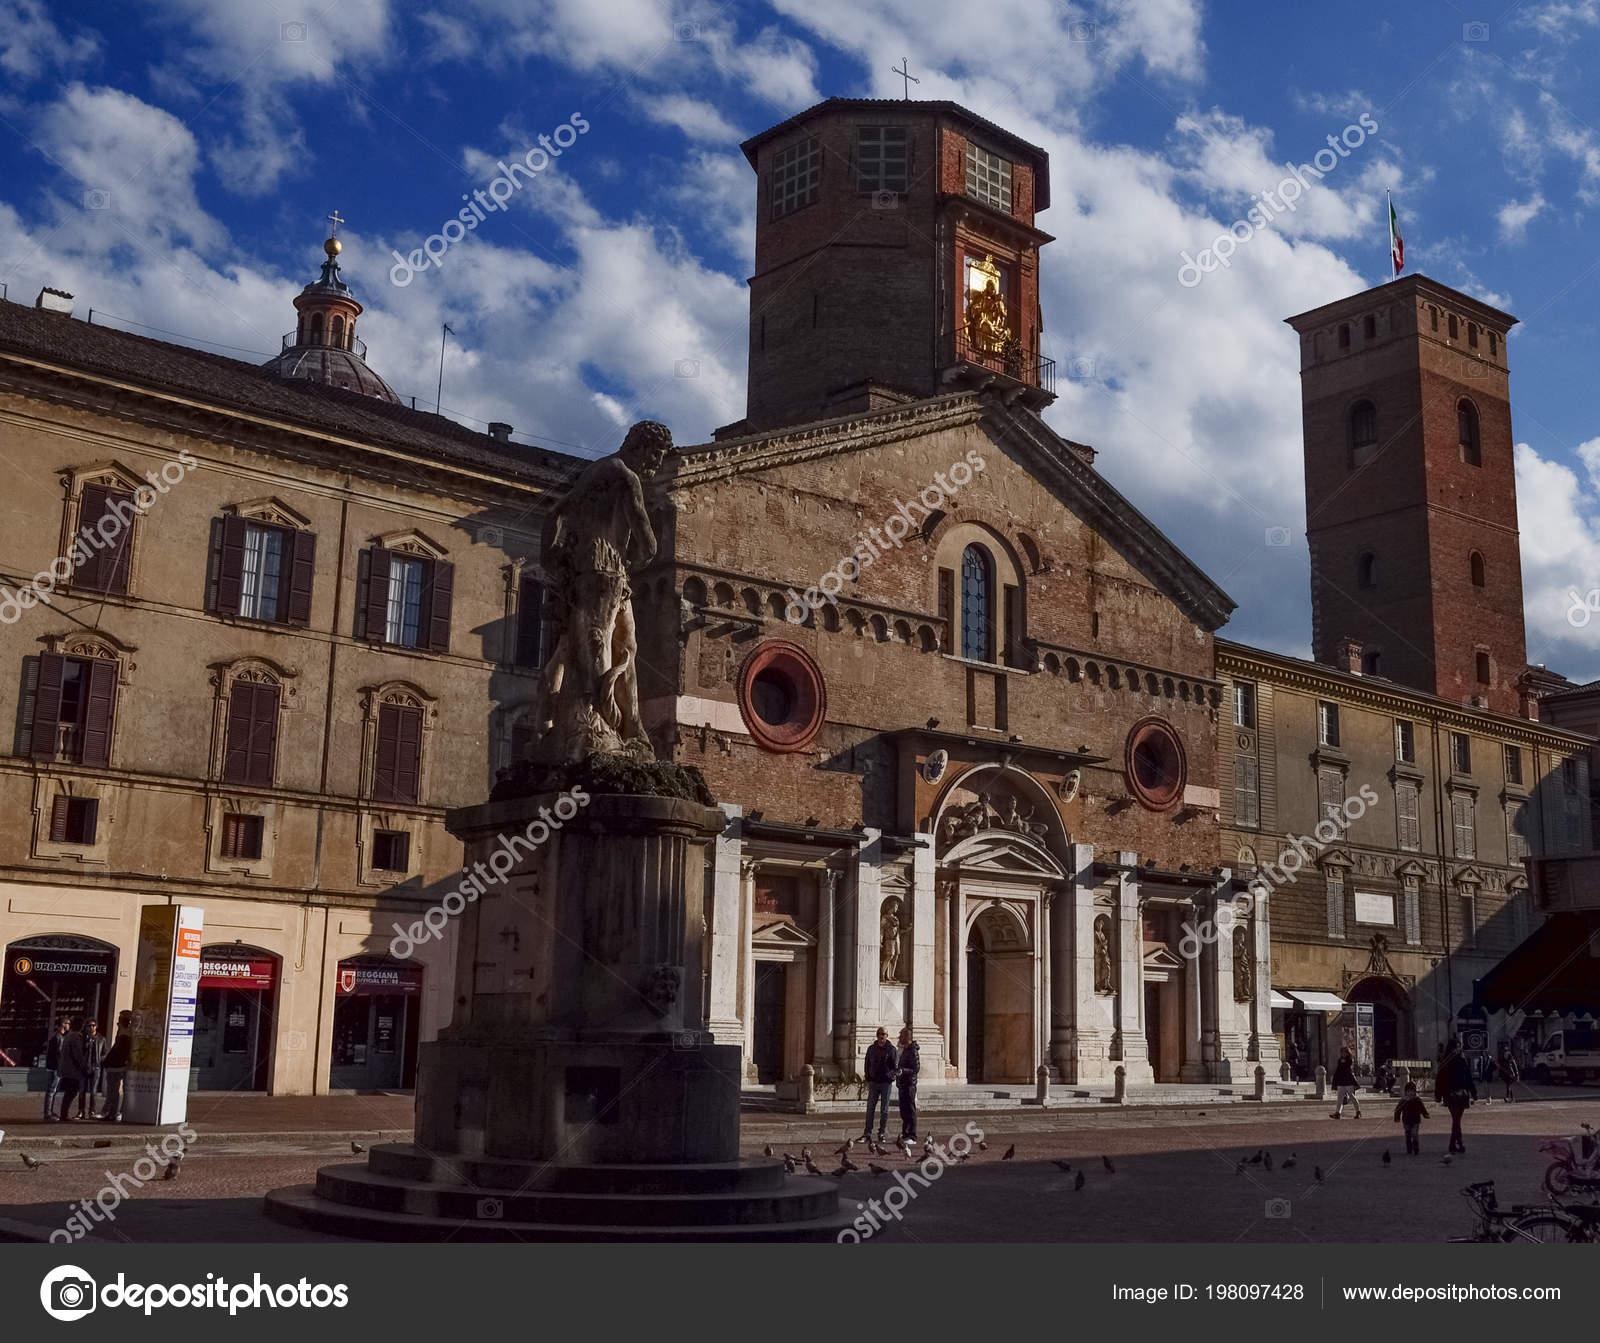 Reggio Emilia Itálie Cca Březen 2018 Turisté Navštívit Centrum Města